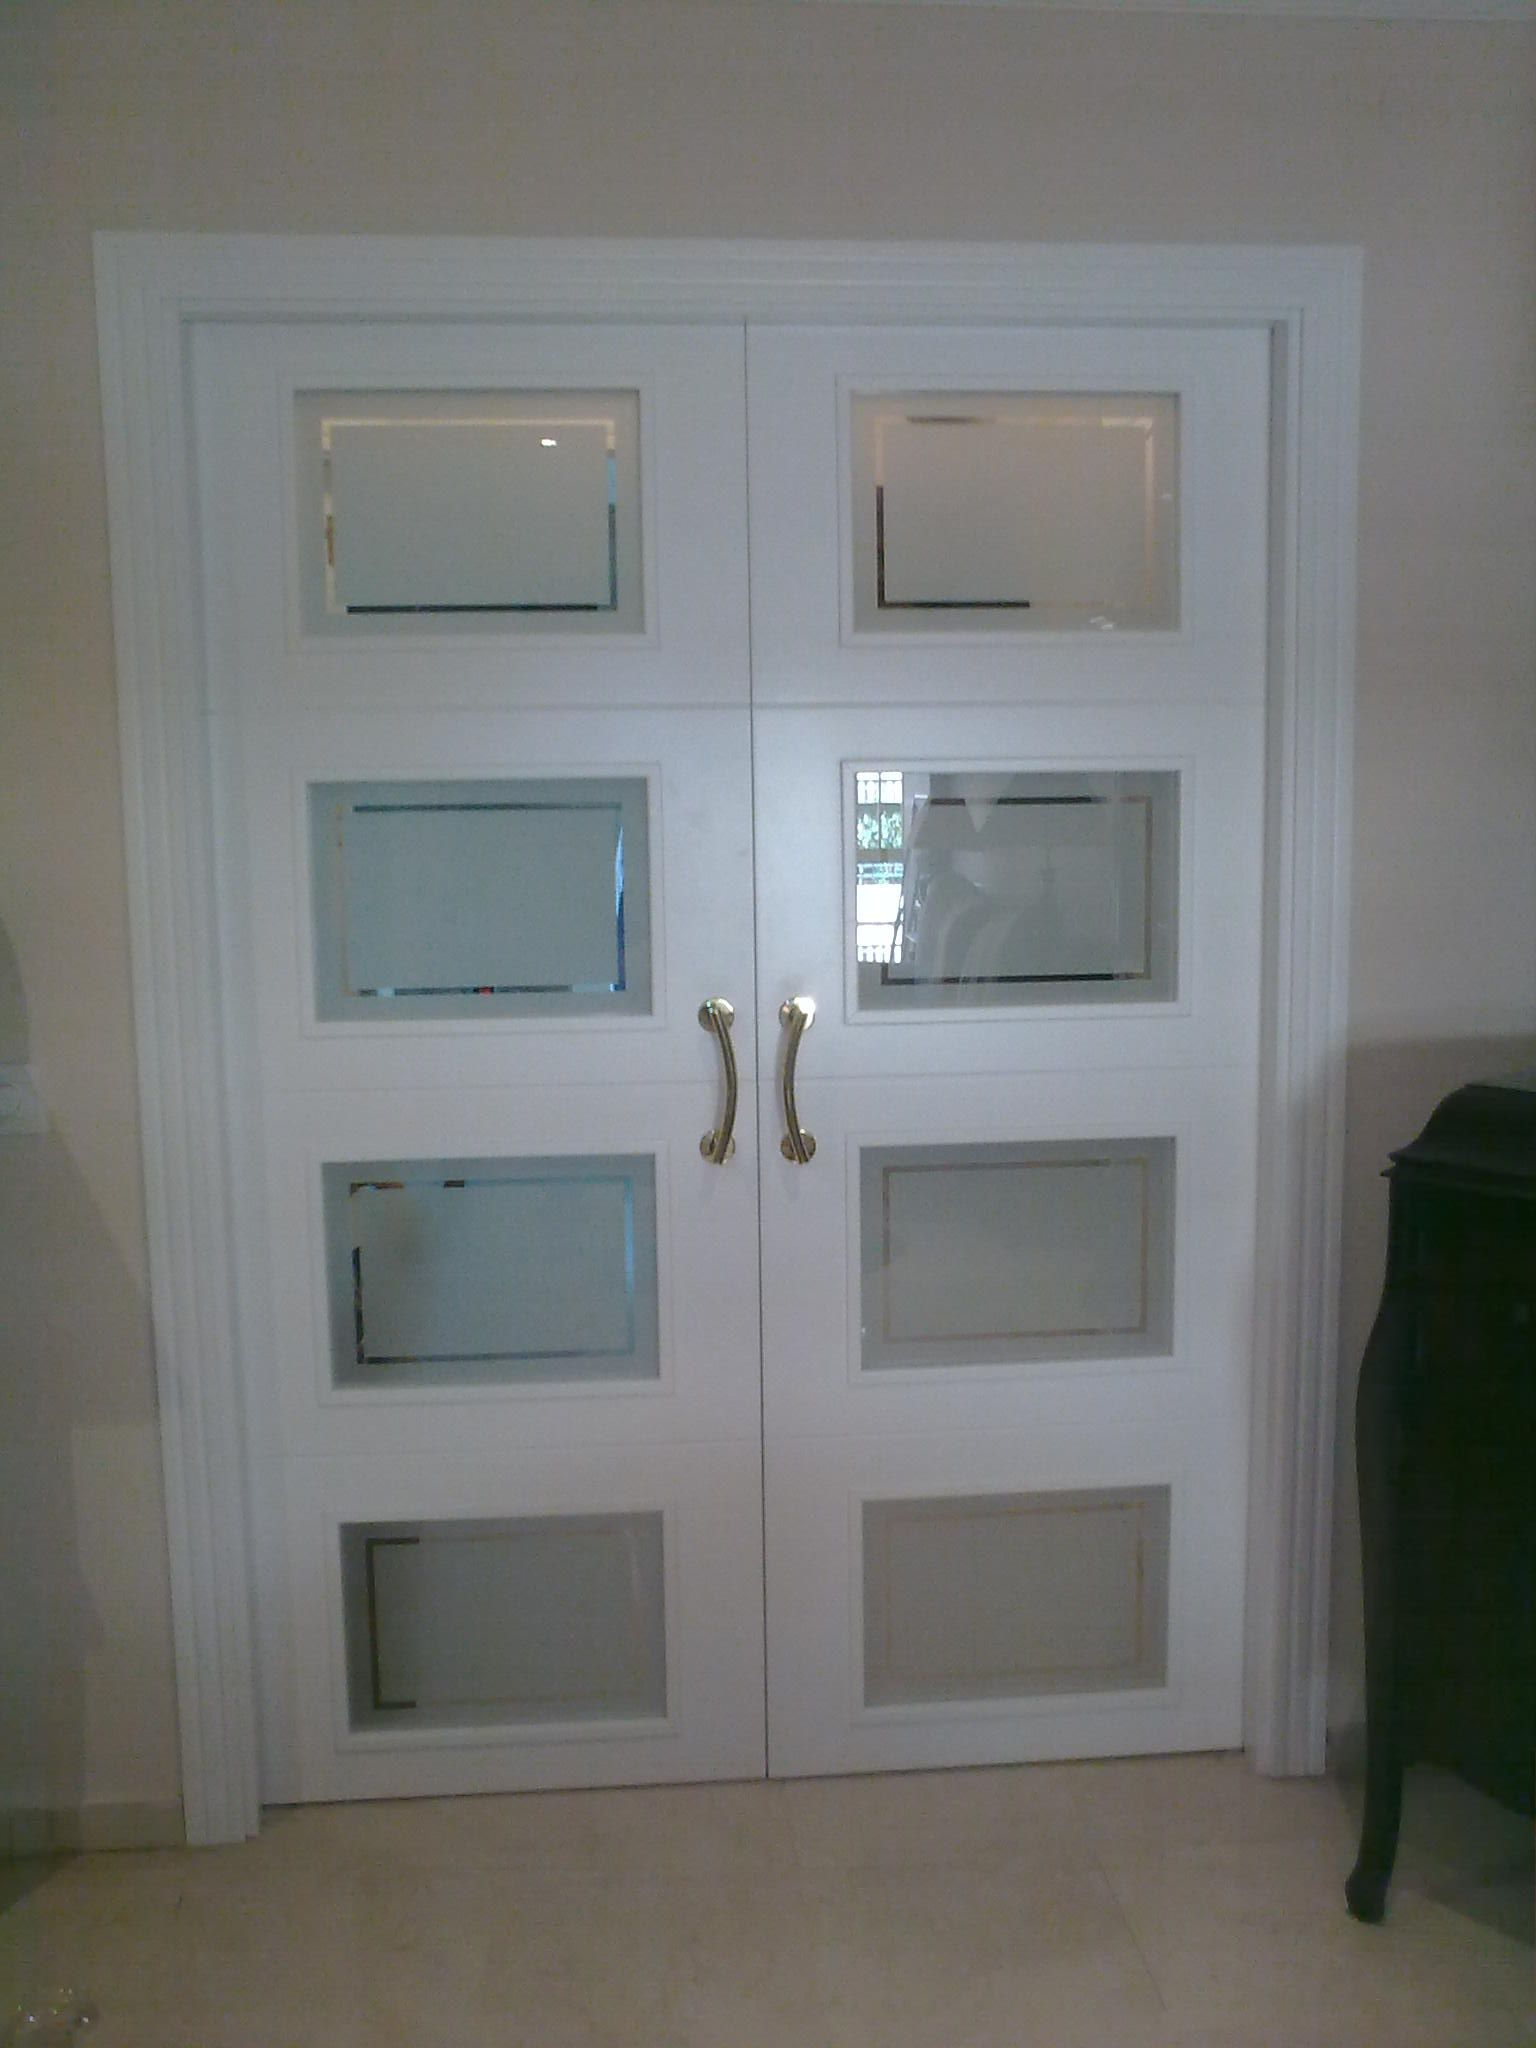 5t12 v57 detalle cristal decorado cenefa puertas for Vidrios decorados para puertas interiores